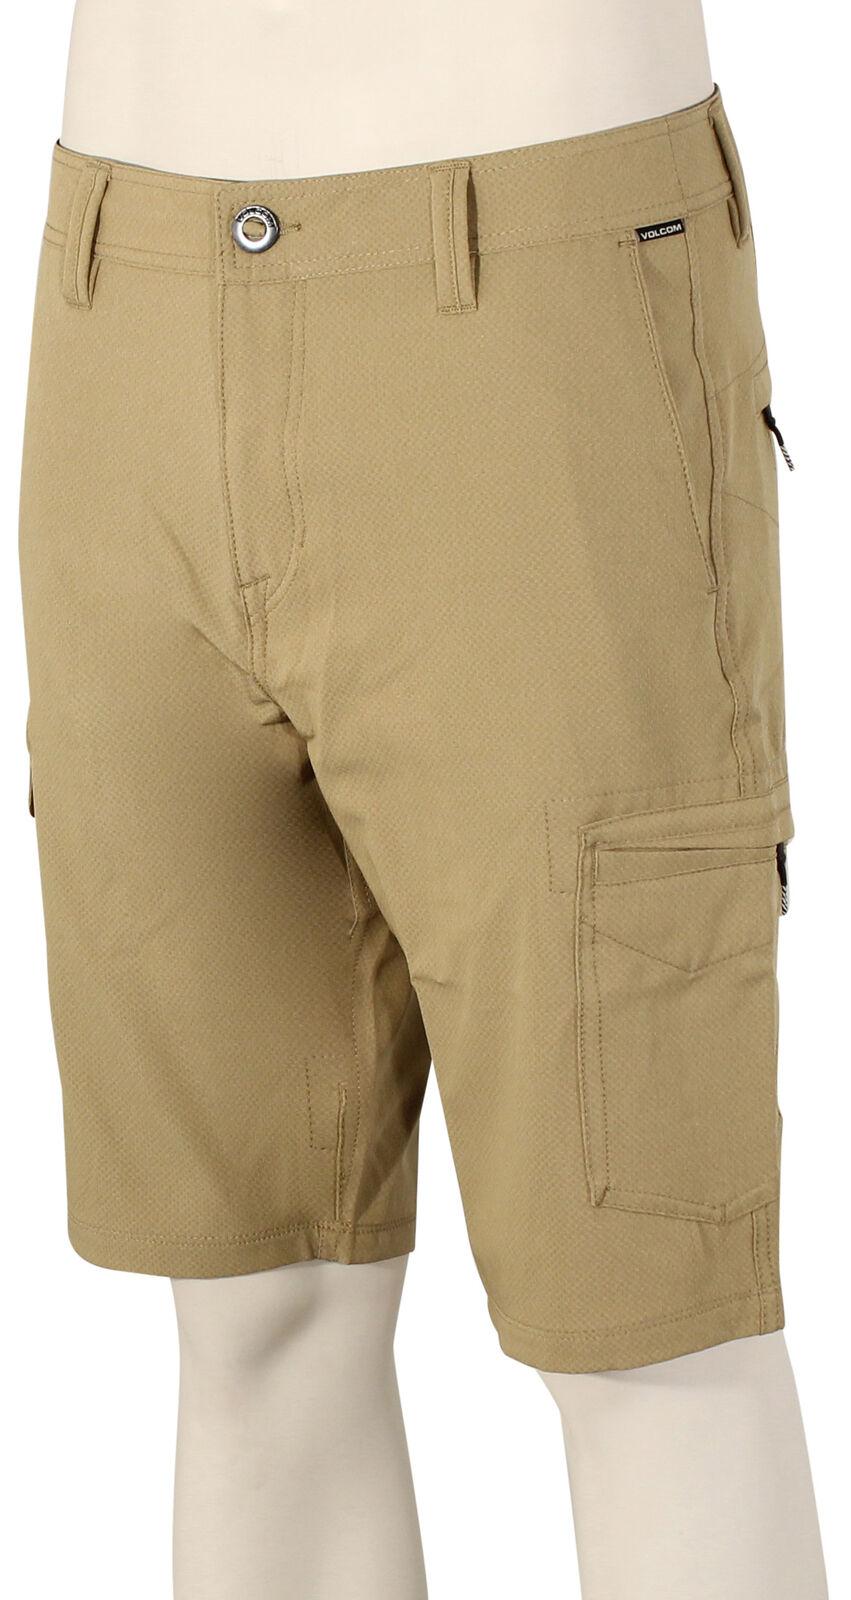 Volcom Surf and Turf  Dry Cargo Shorts - Khaki - New